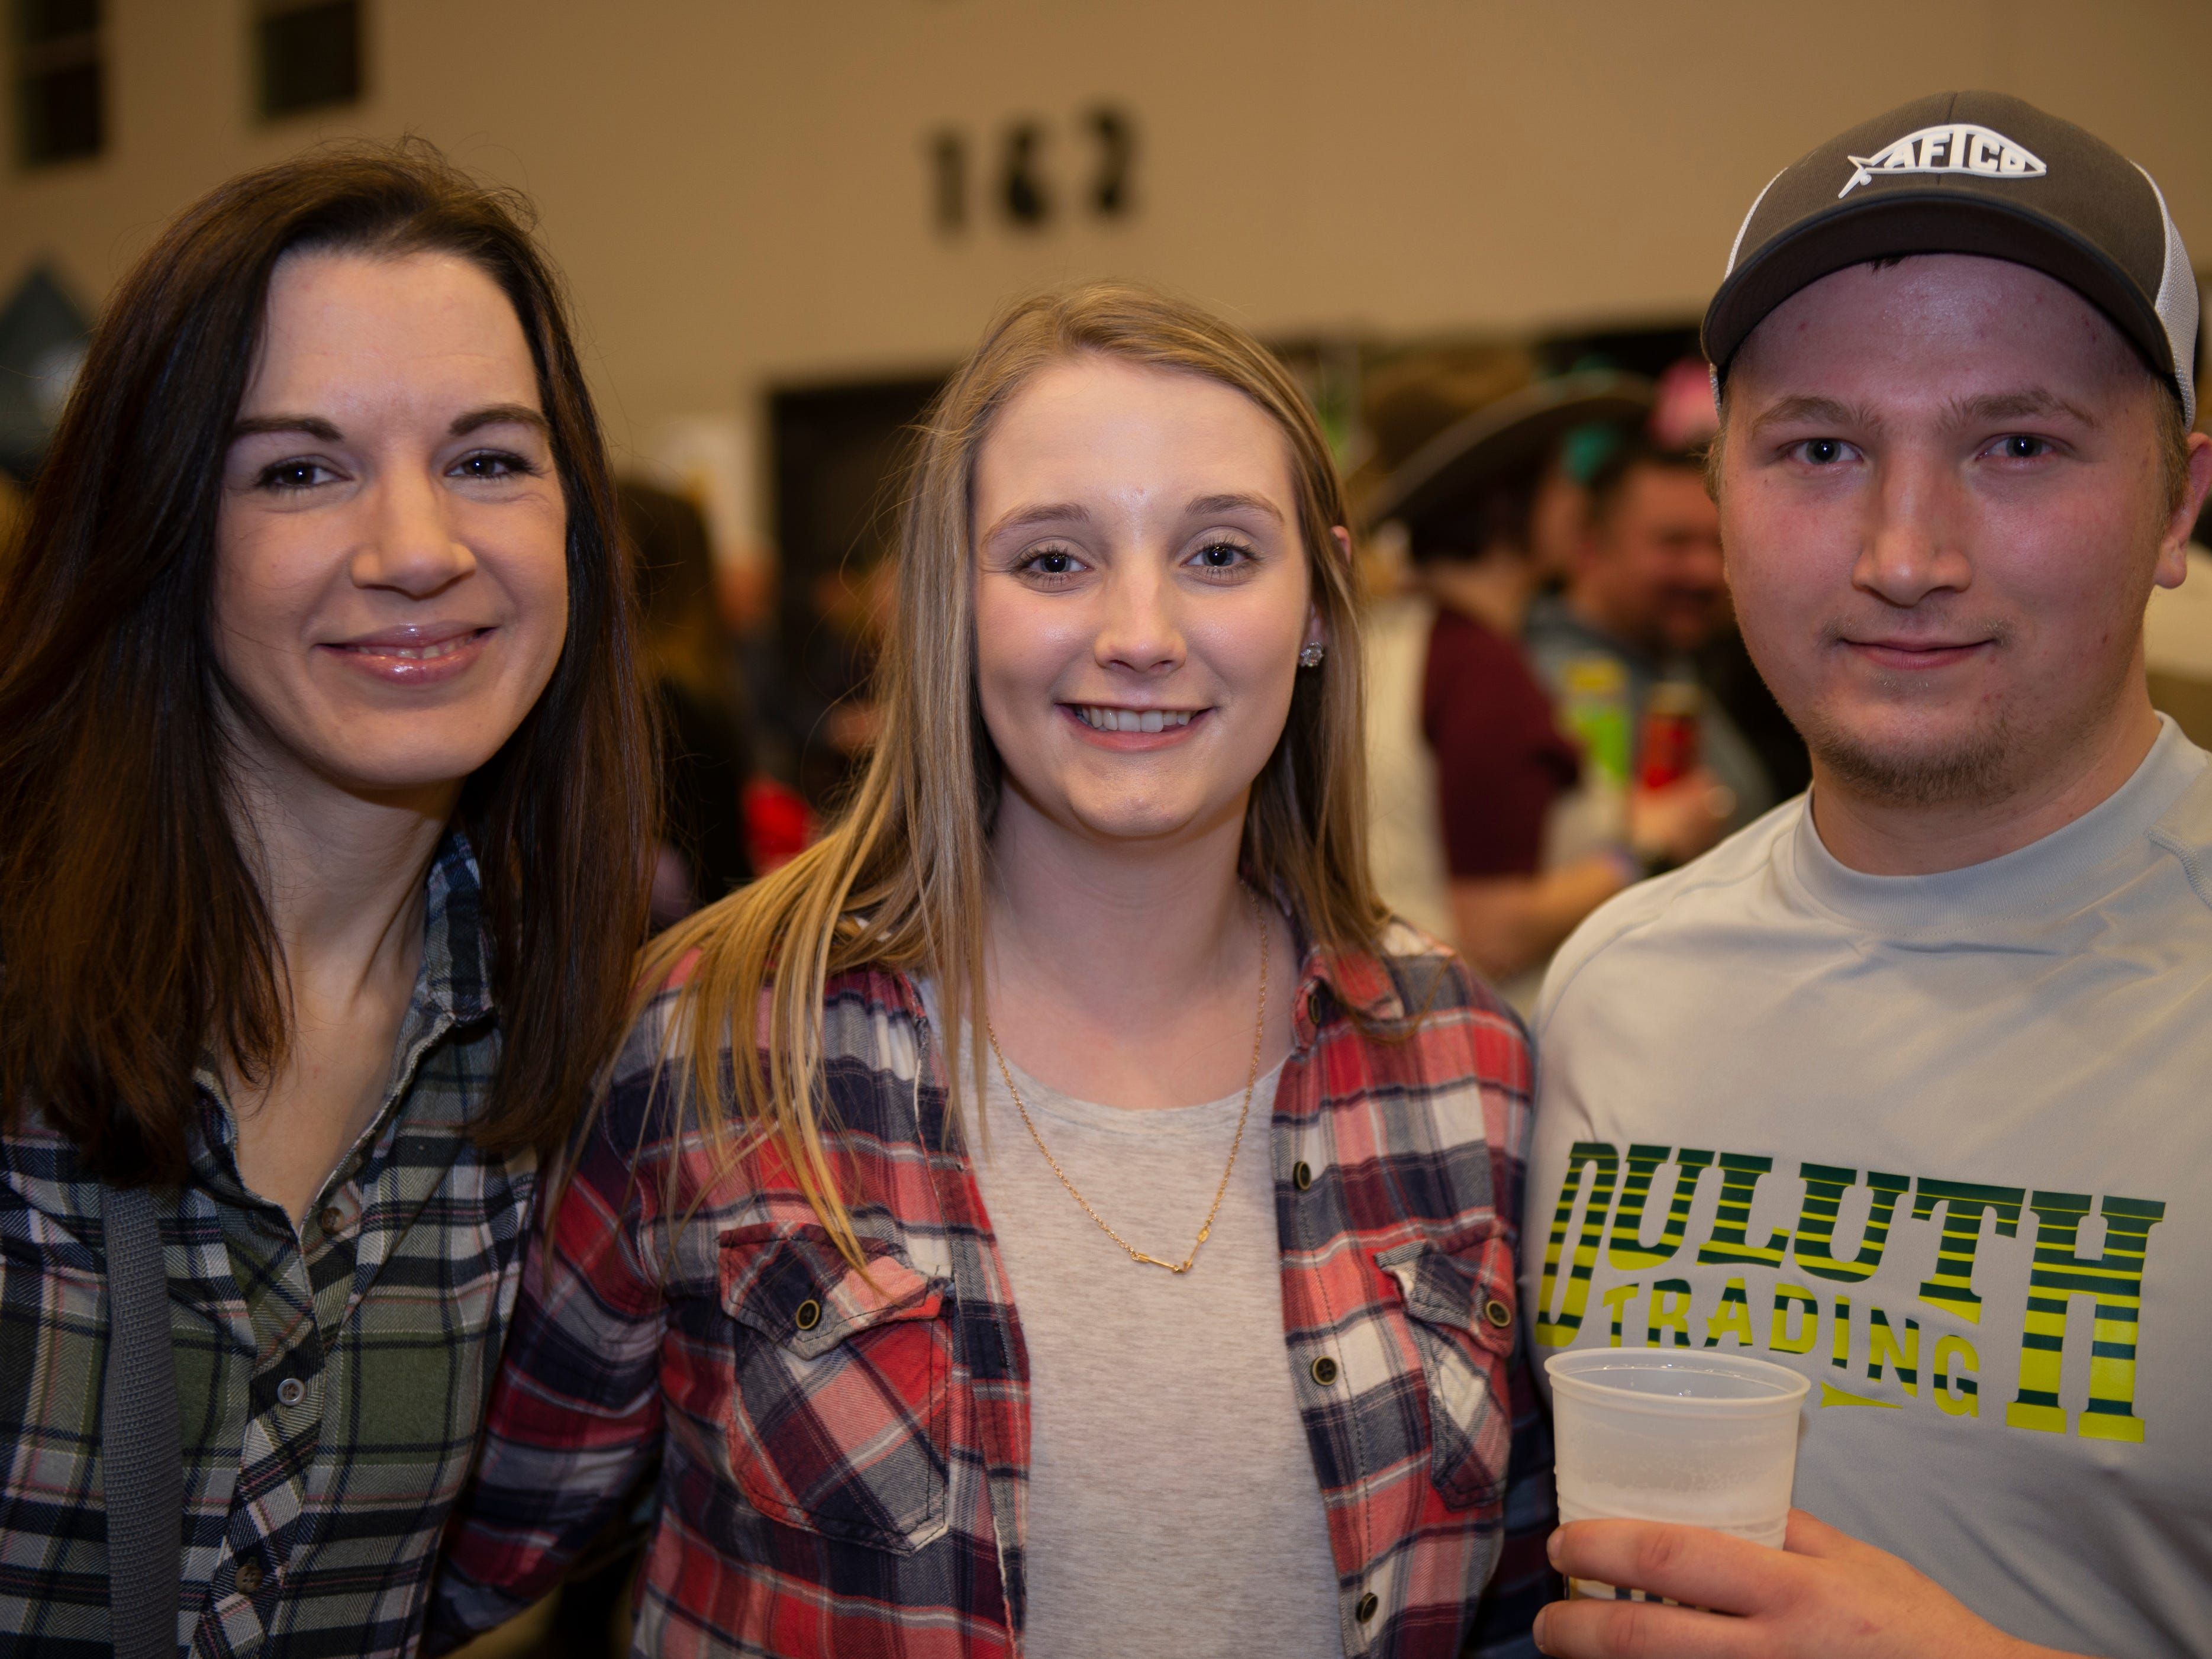 Braydon Hicks, Kendra Wad, Deidra Whitaker